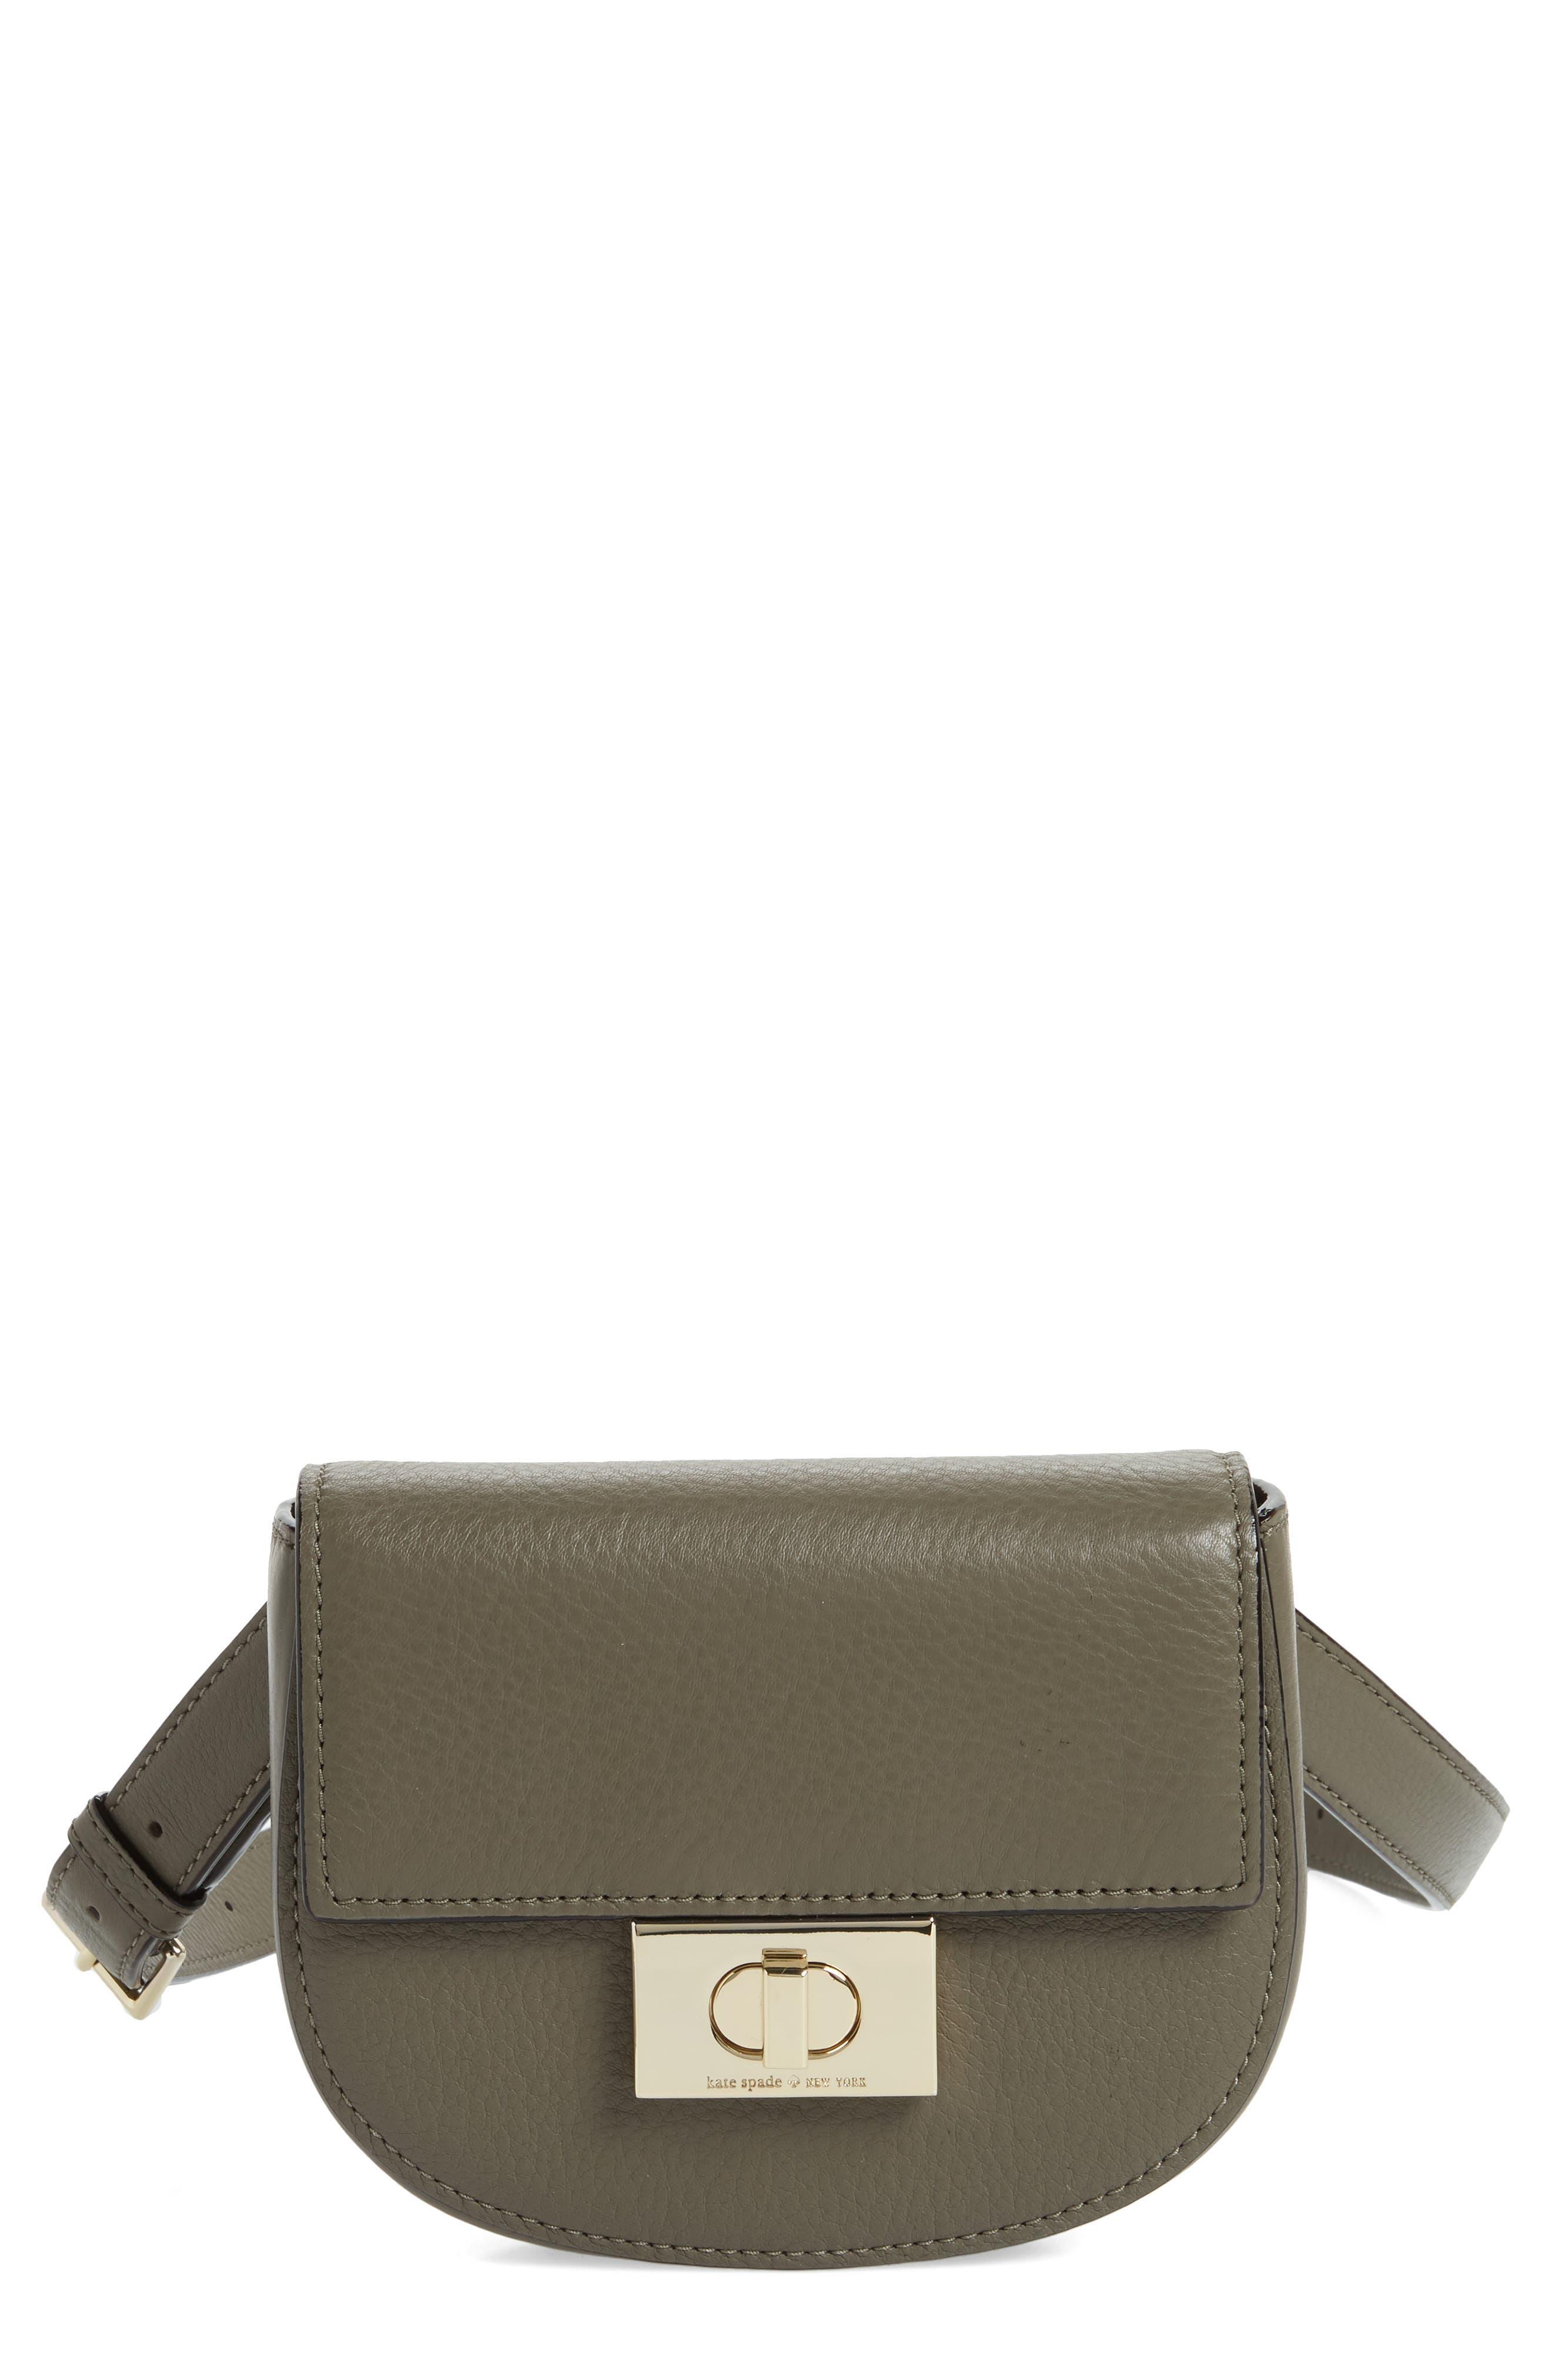 Main Image - kate spade new york greenwood place rita leather belt bag